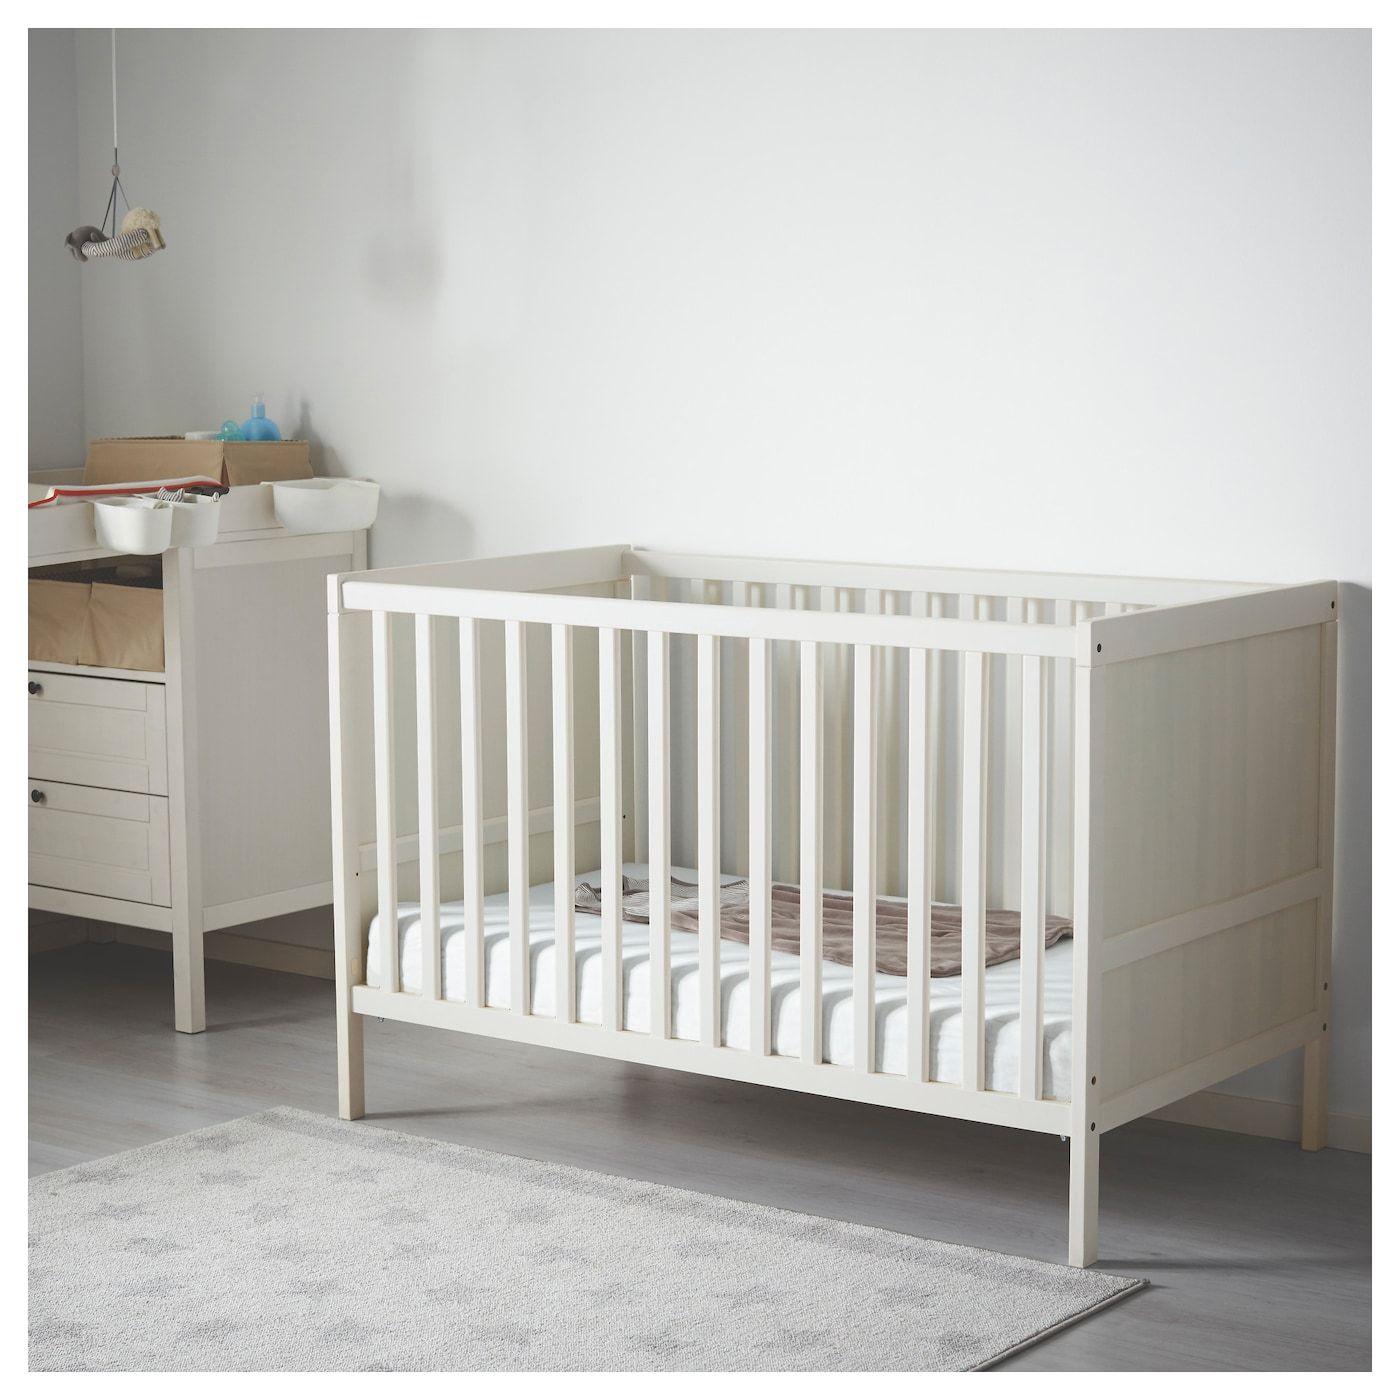 "SUNDVIK Crib white 27 1/2x52 "" (70x132 cm) Ikea"